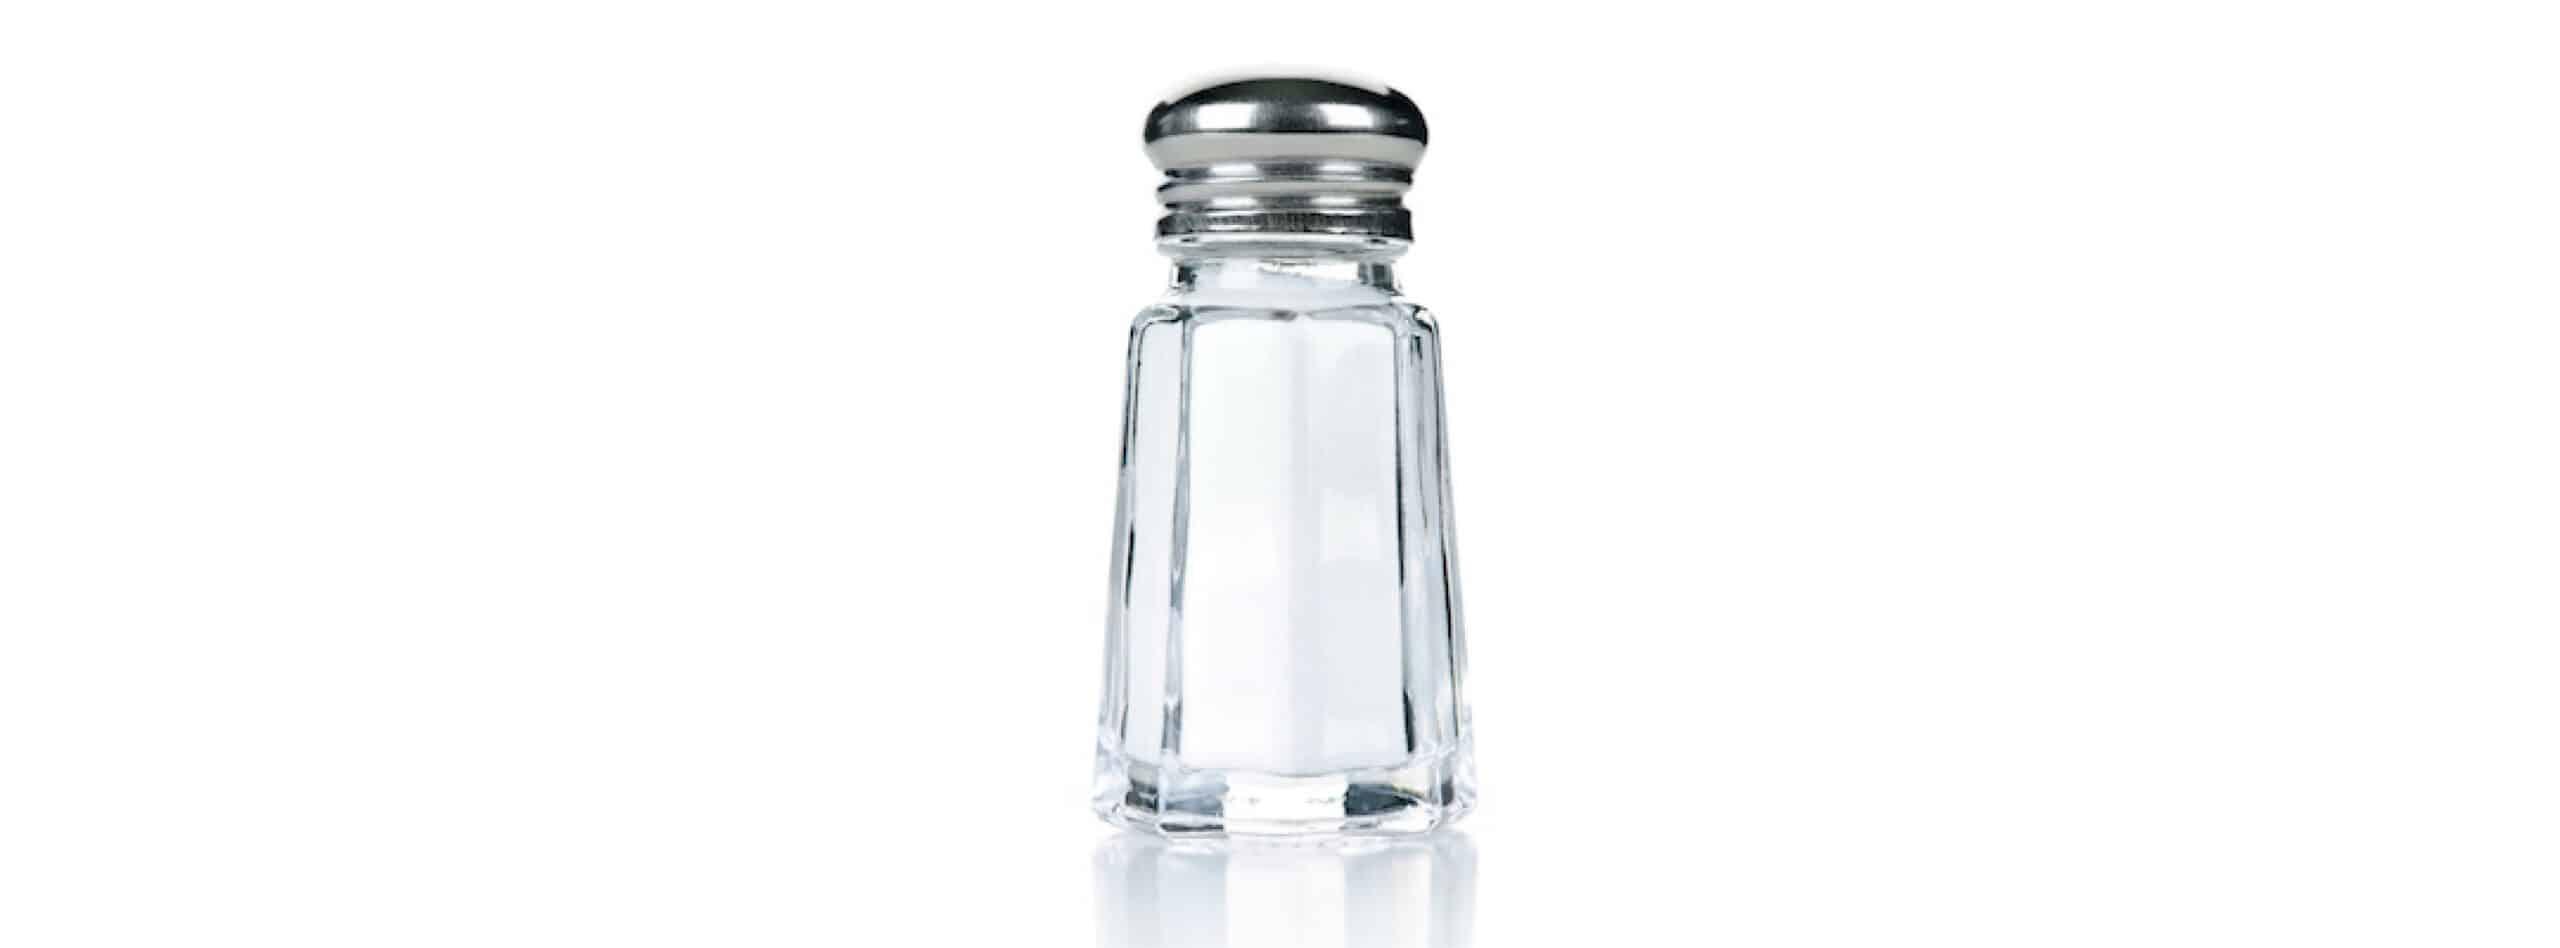 Is Salt in Baby Food Okay   New Ways Nutrition